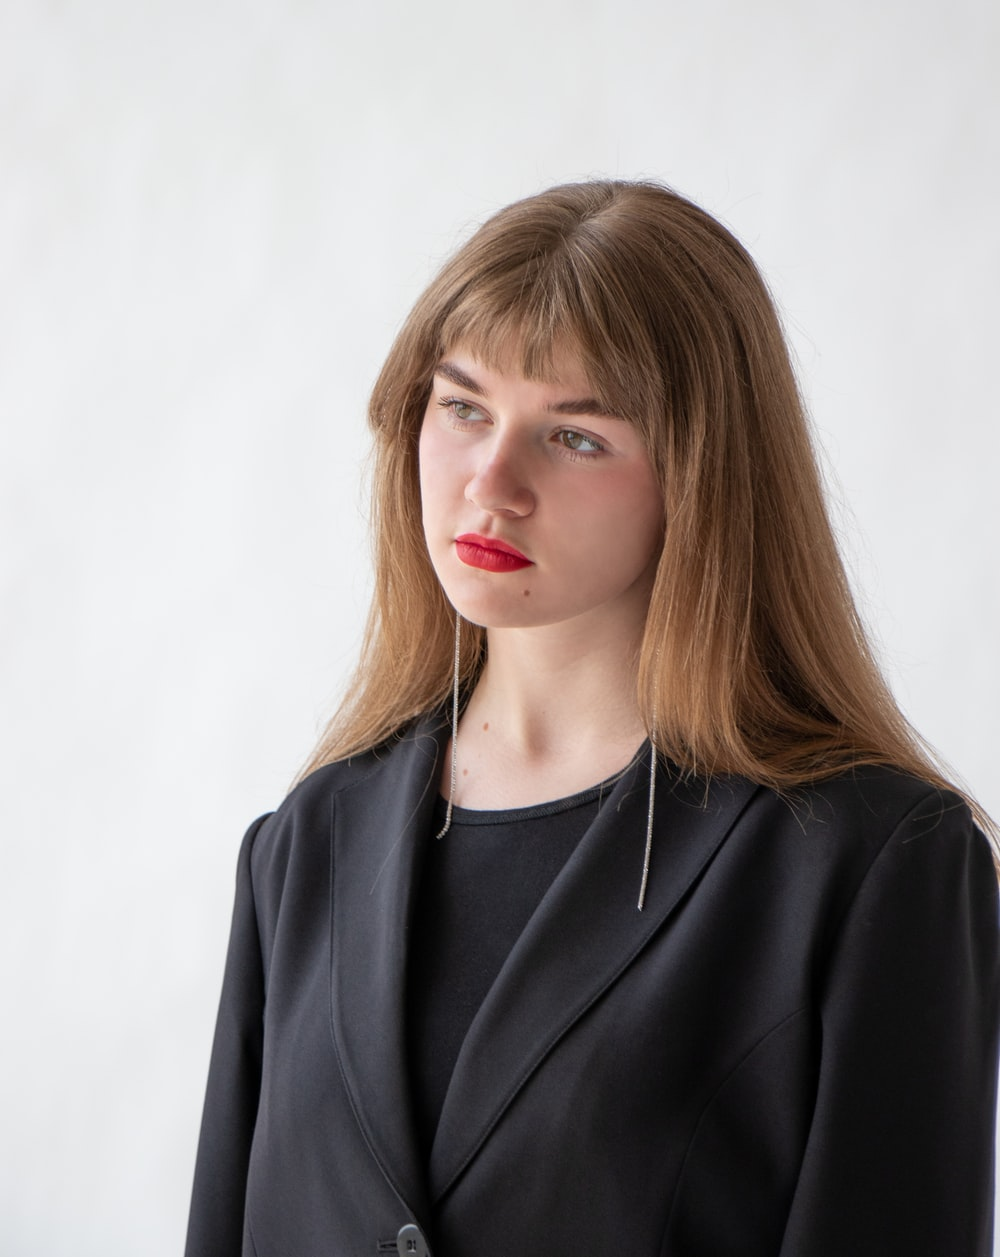 woman in black blazer with blonde hair